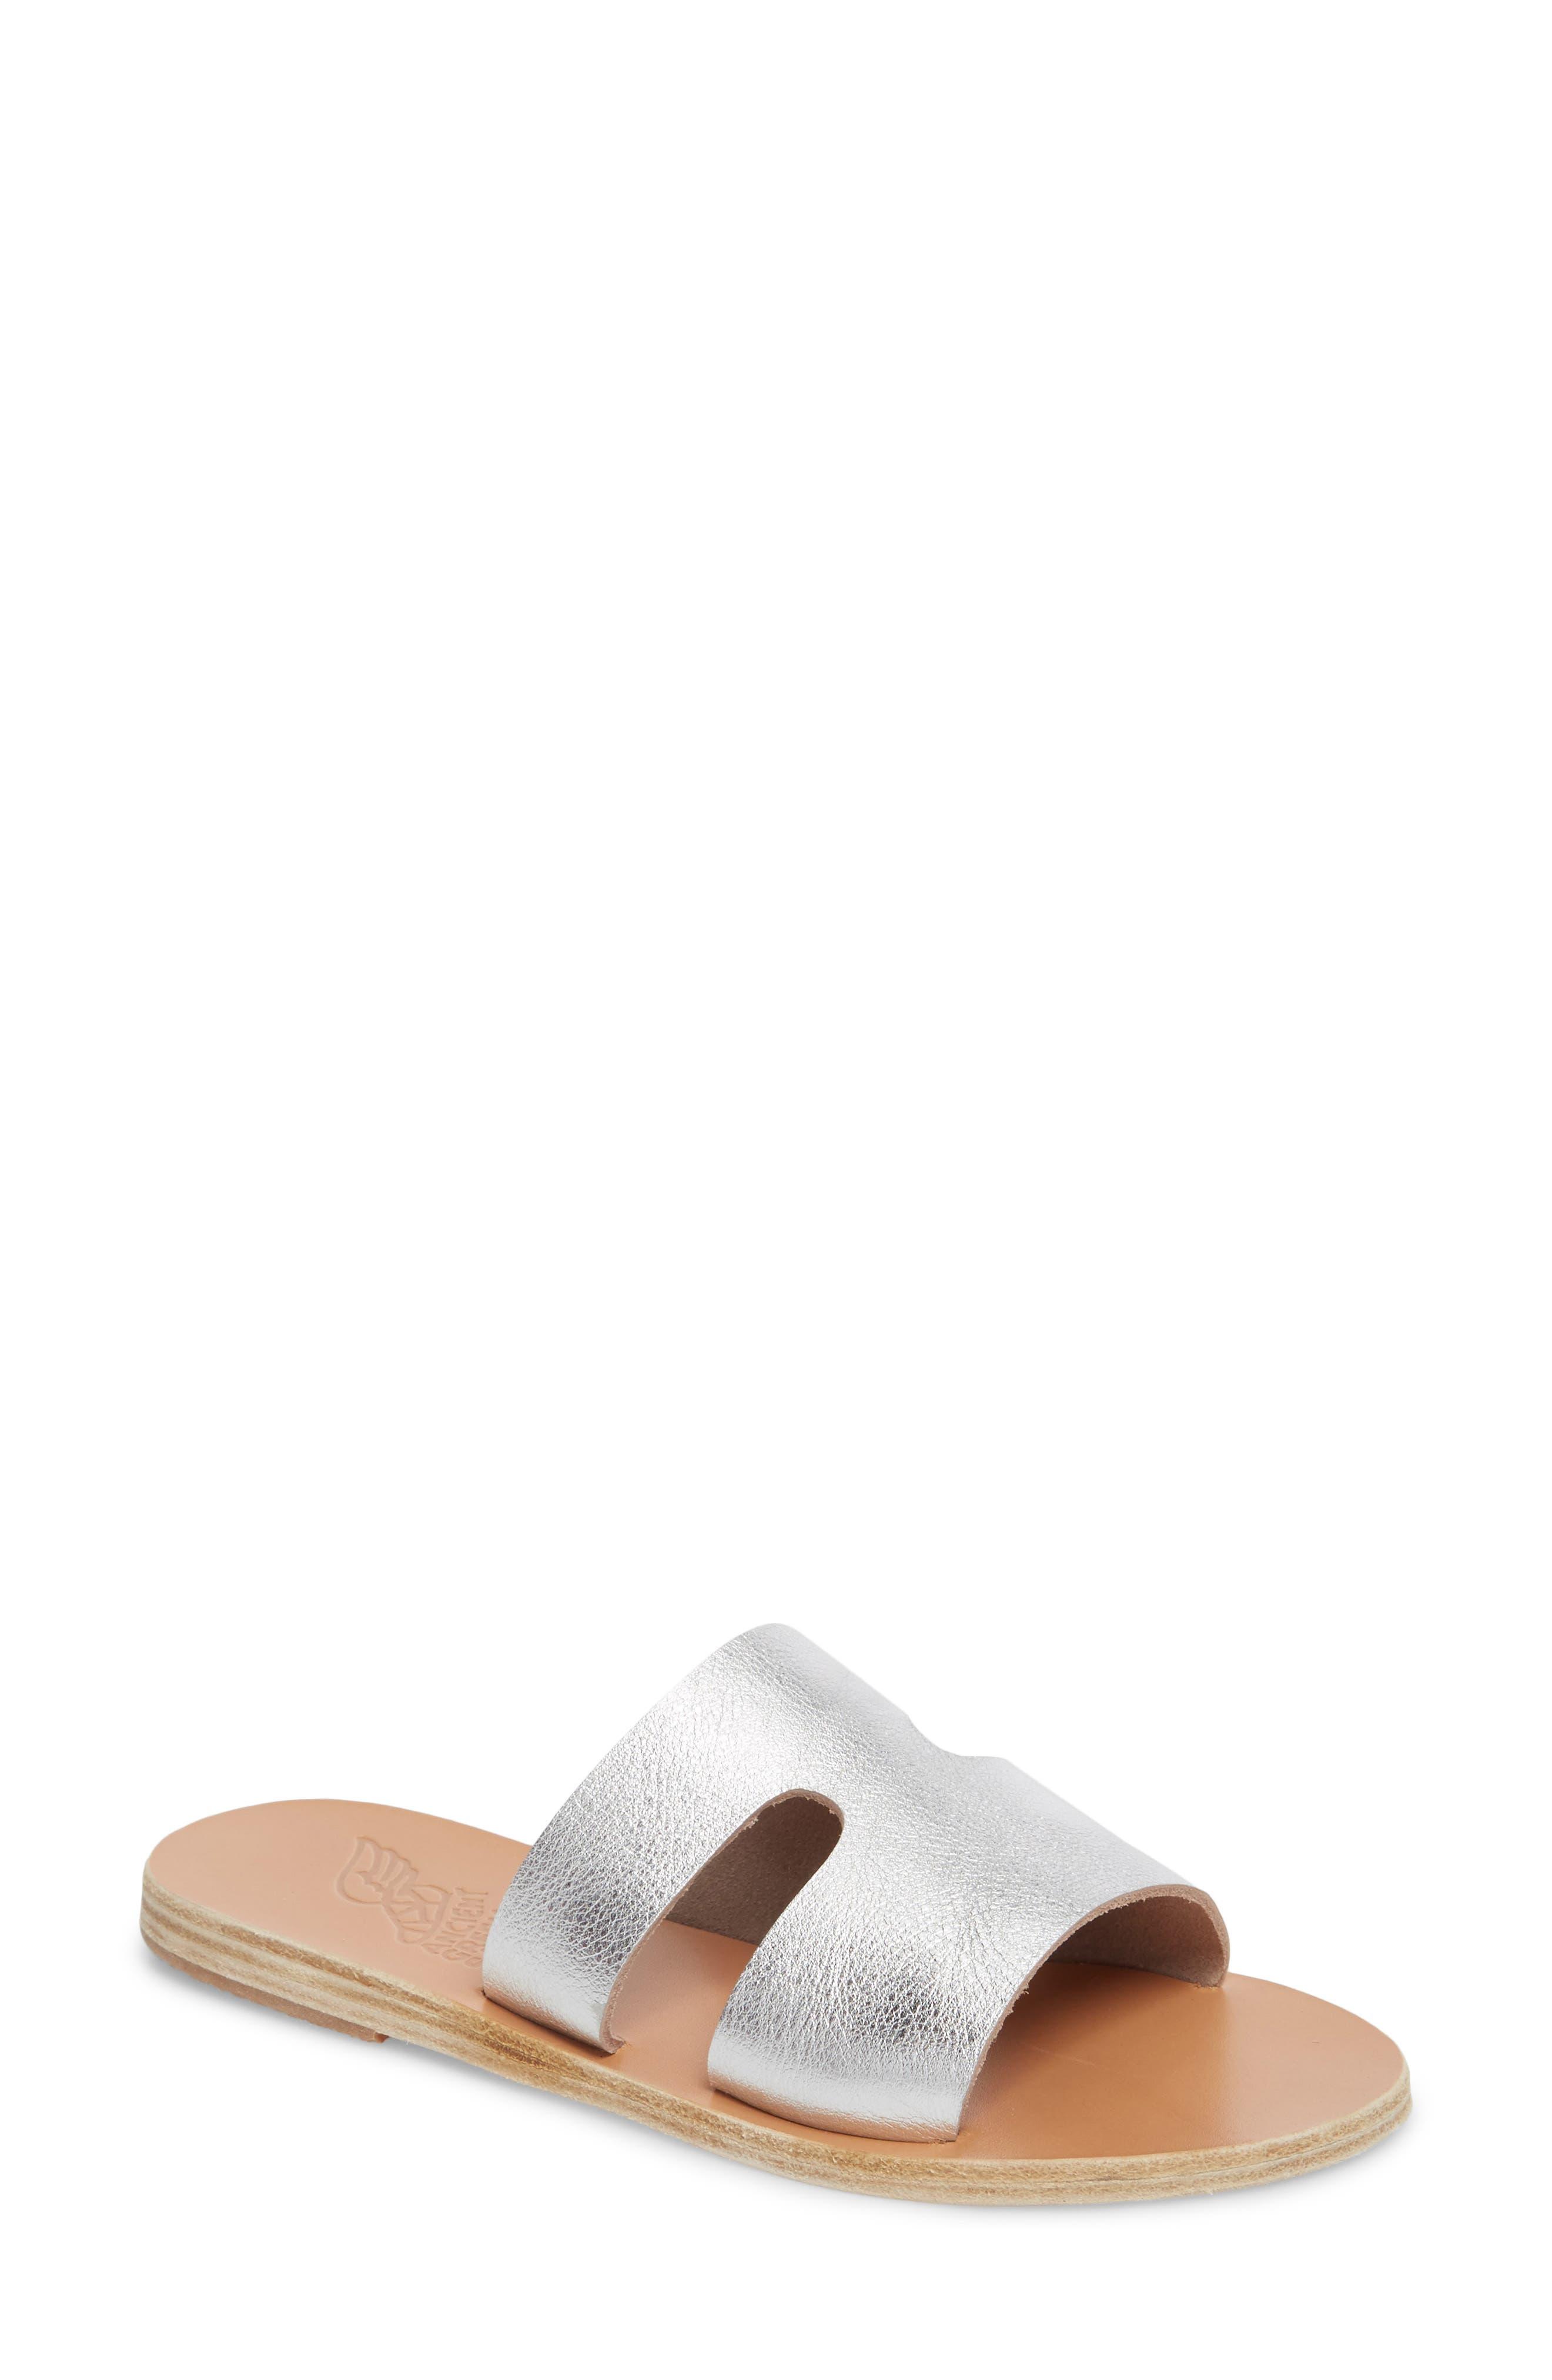 Apteros Slide Sandal,                         Main,                         color, METAL SILVER